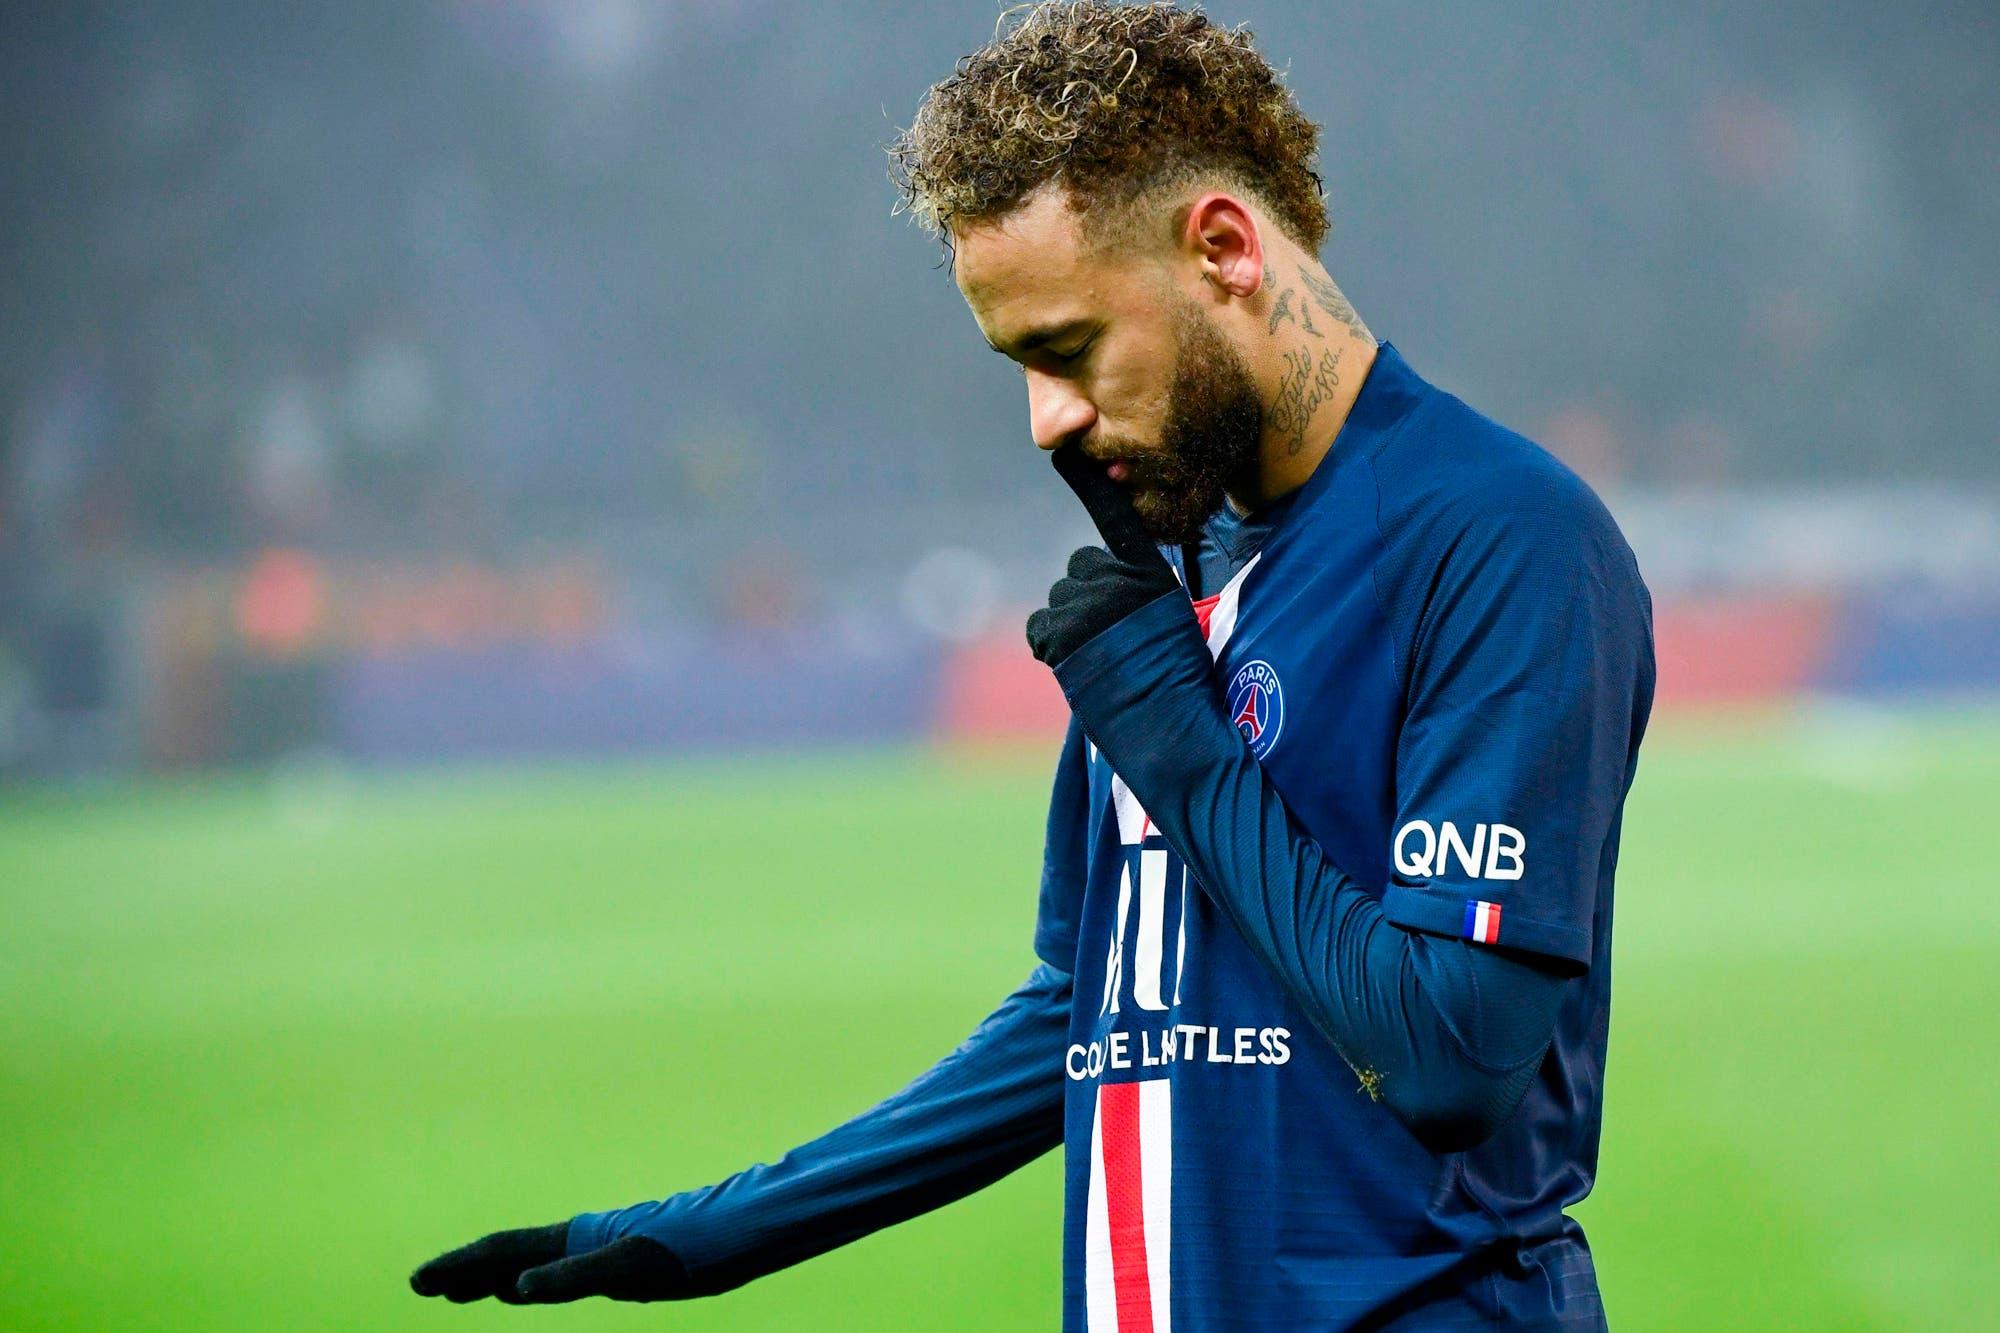 Ganó PSG: el golazo de taco de Mbappé, el gesto de Neymar a los hinchas y el blooper de Cavani